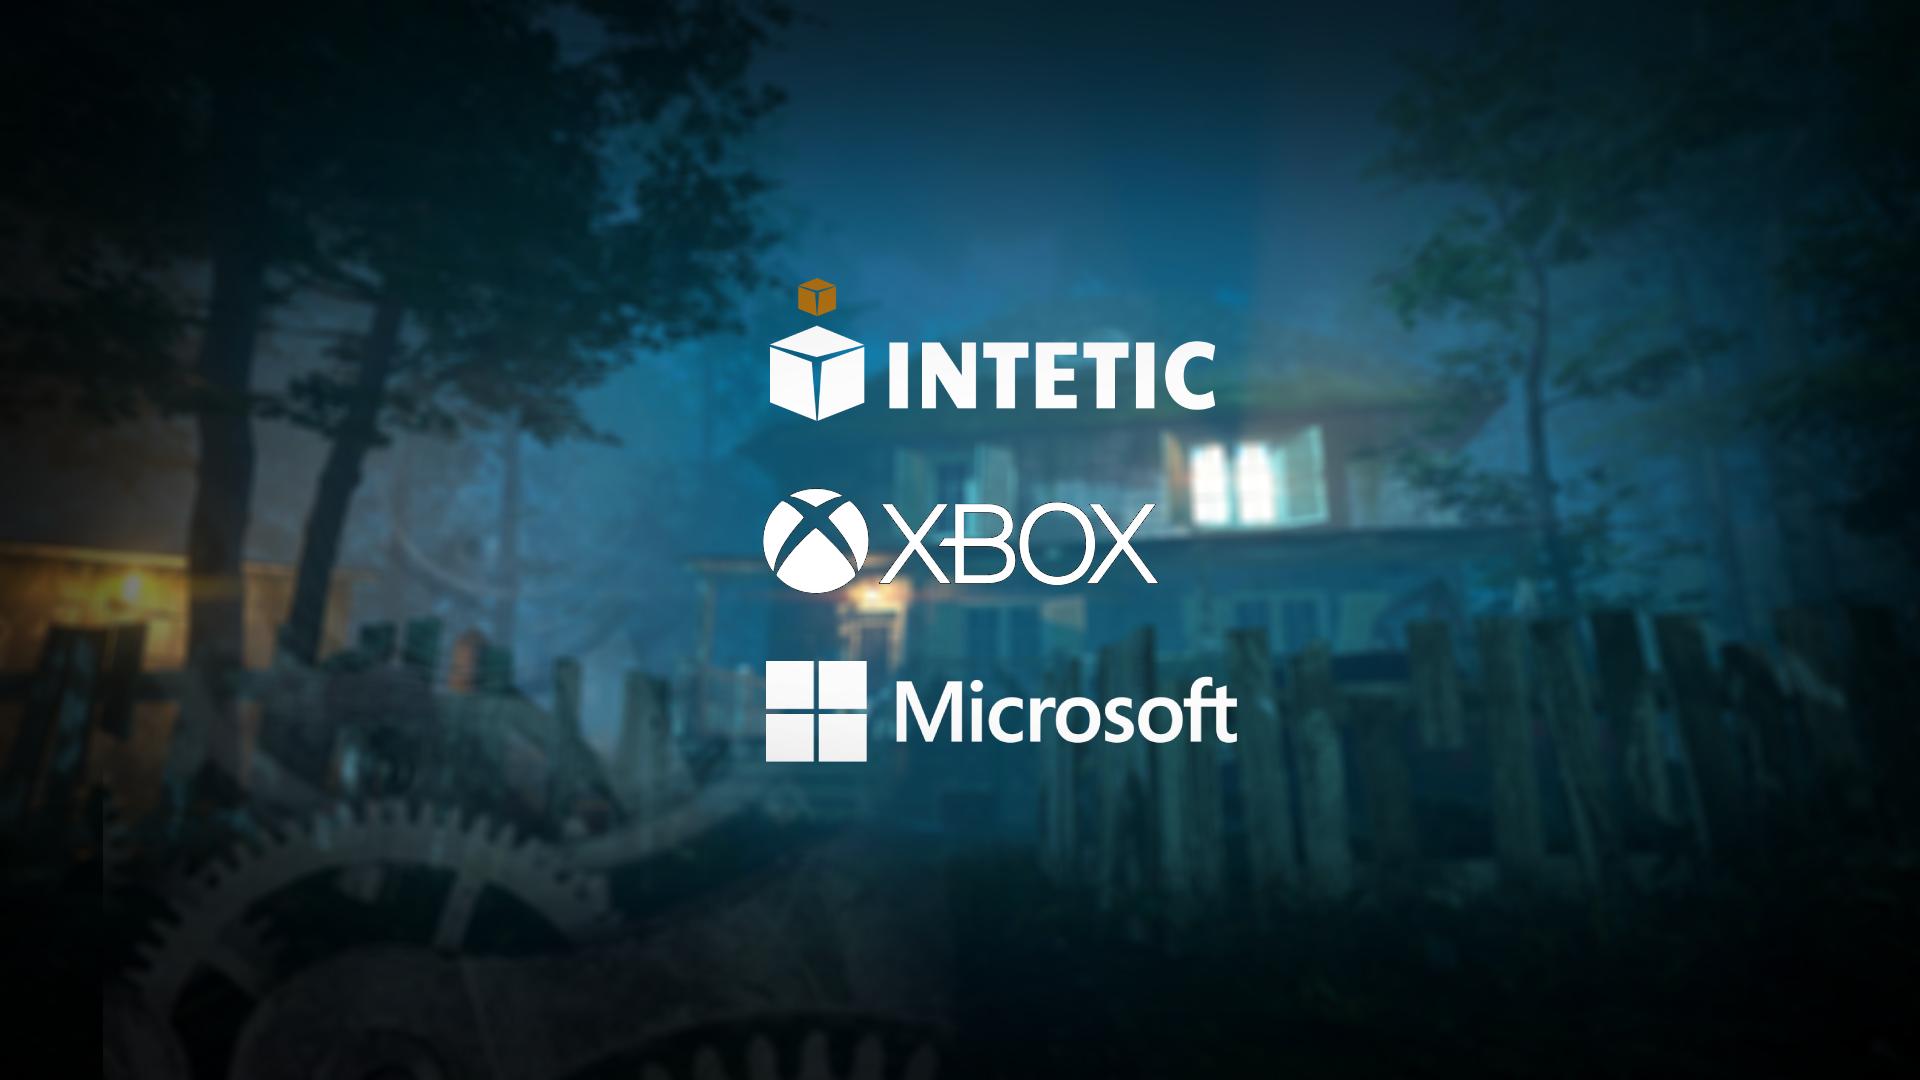 Intetic - Xbox - Microsoft